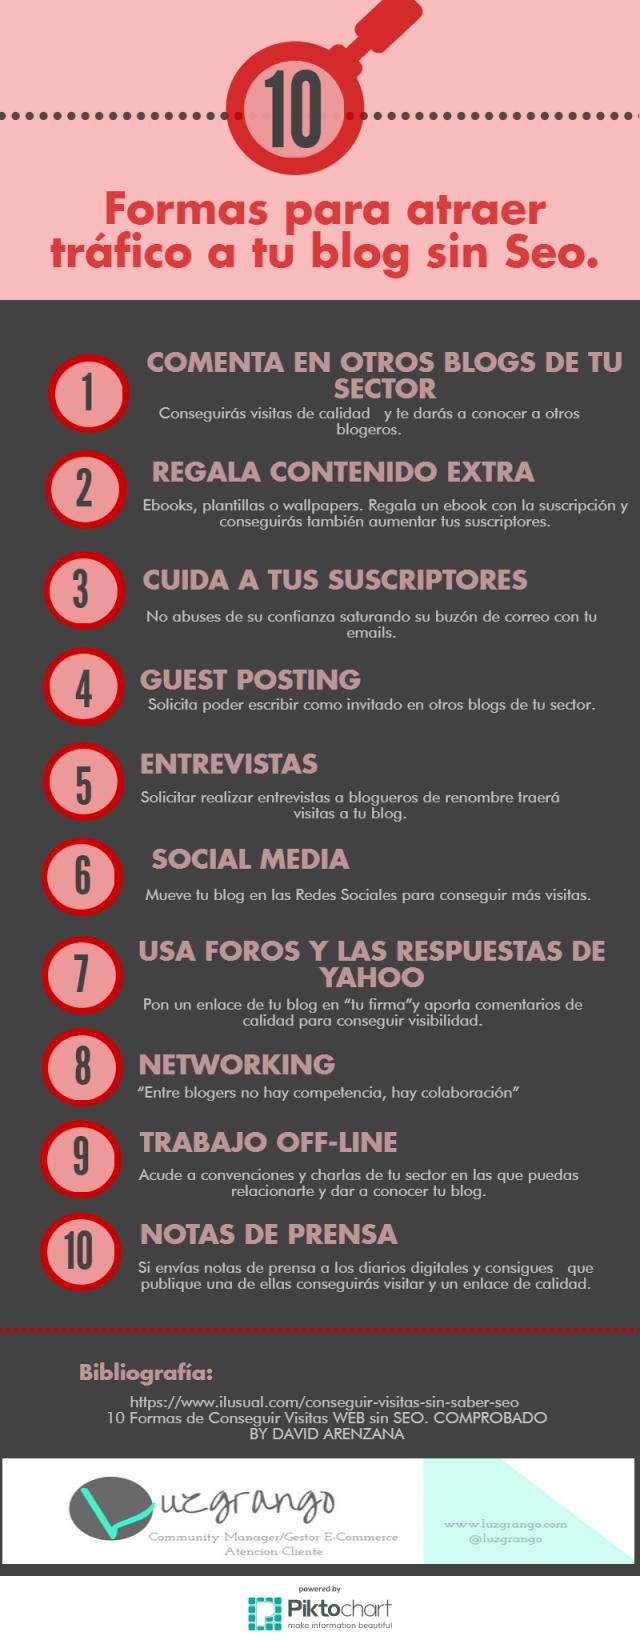 10 formas de atraer tráfico a tu Blog sin SEO